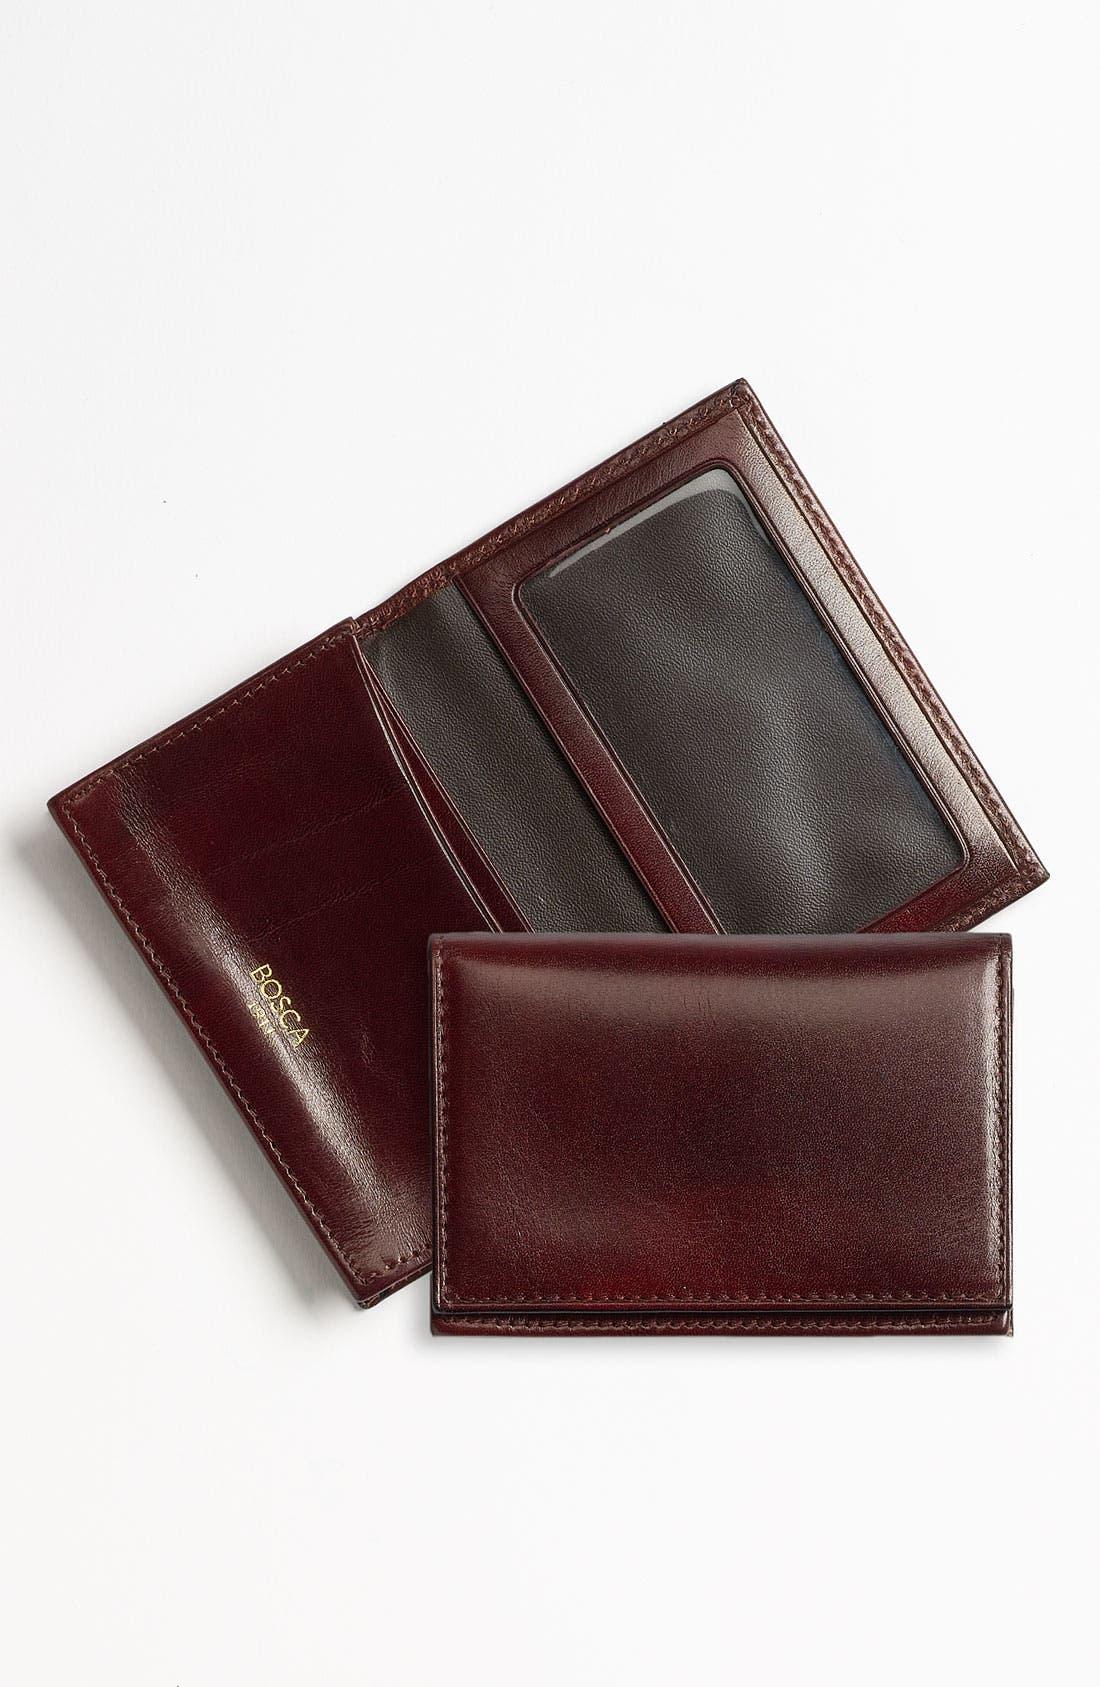 'Old Leather' Gusset Wallet,                         Main,                         color, DARK BROWN